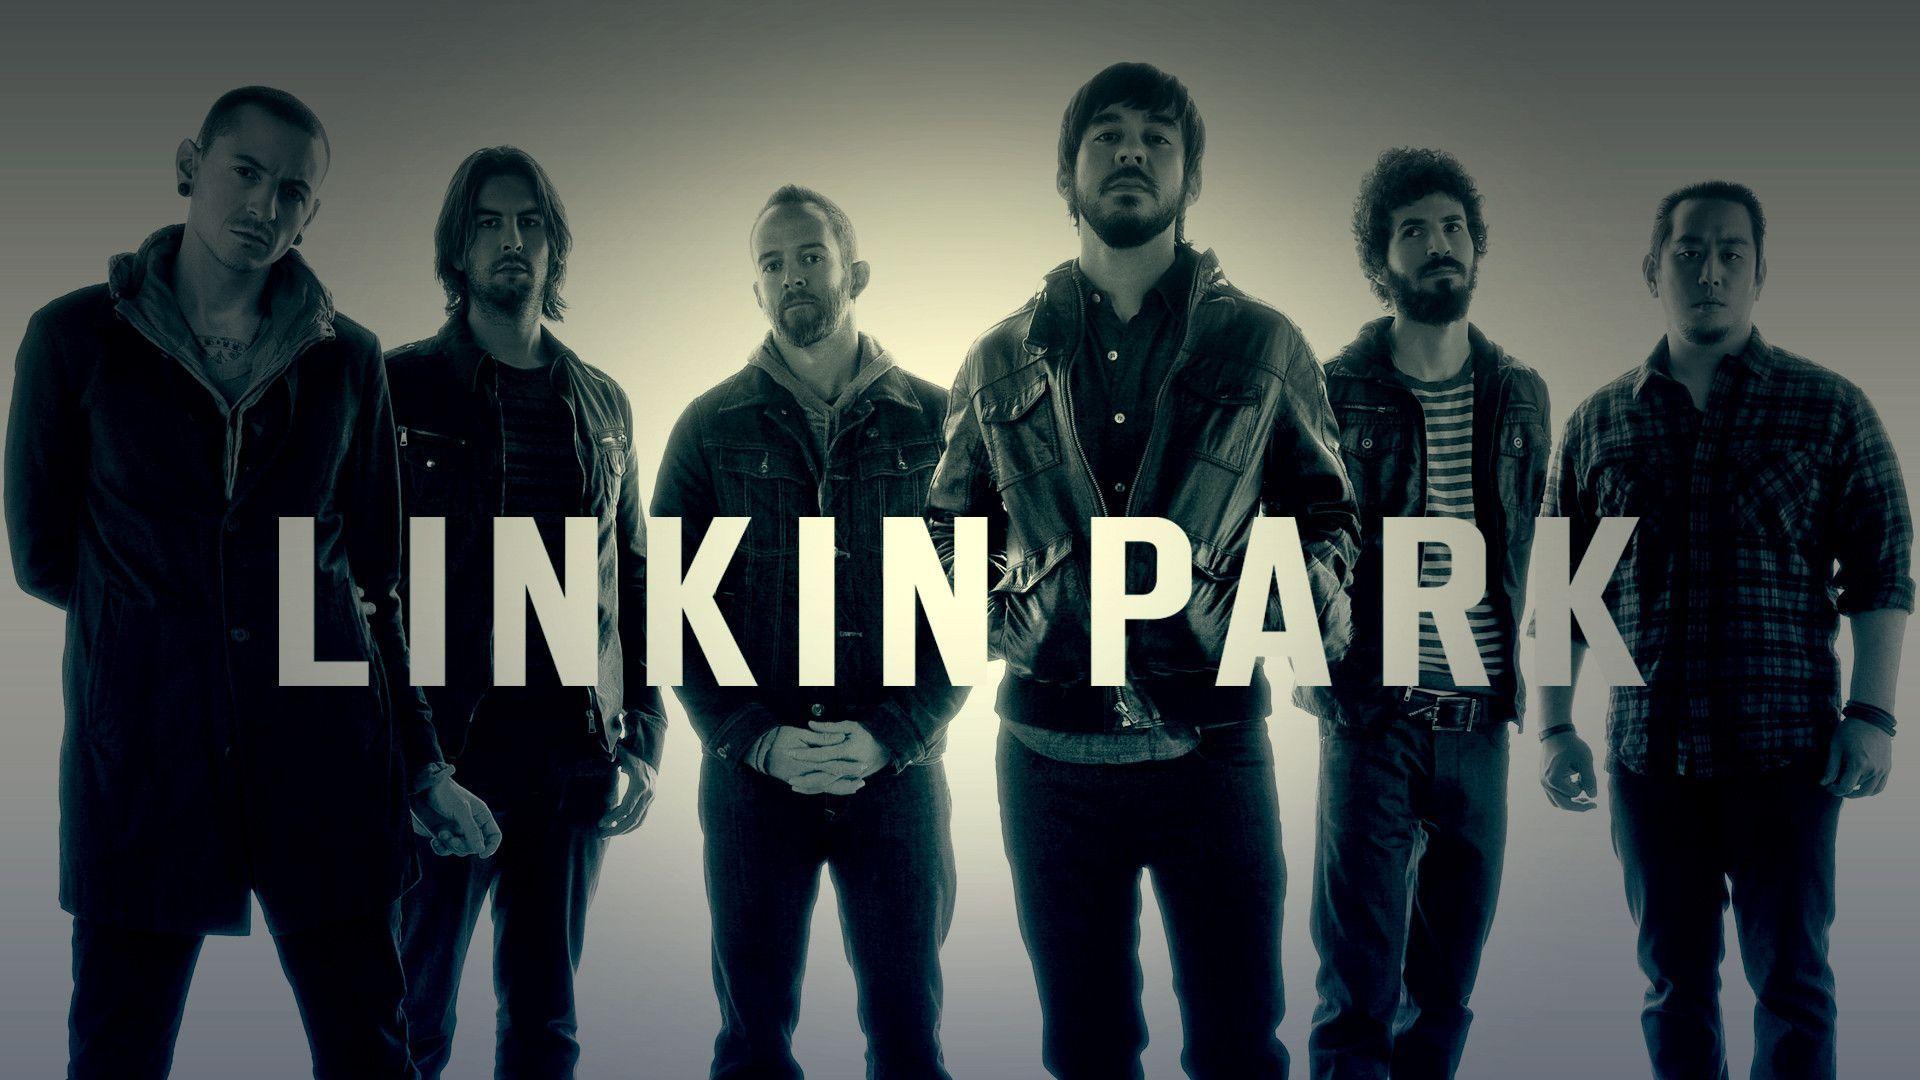 Download Linkin Park Wallpaper Hd Backgrounds Download